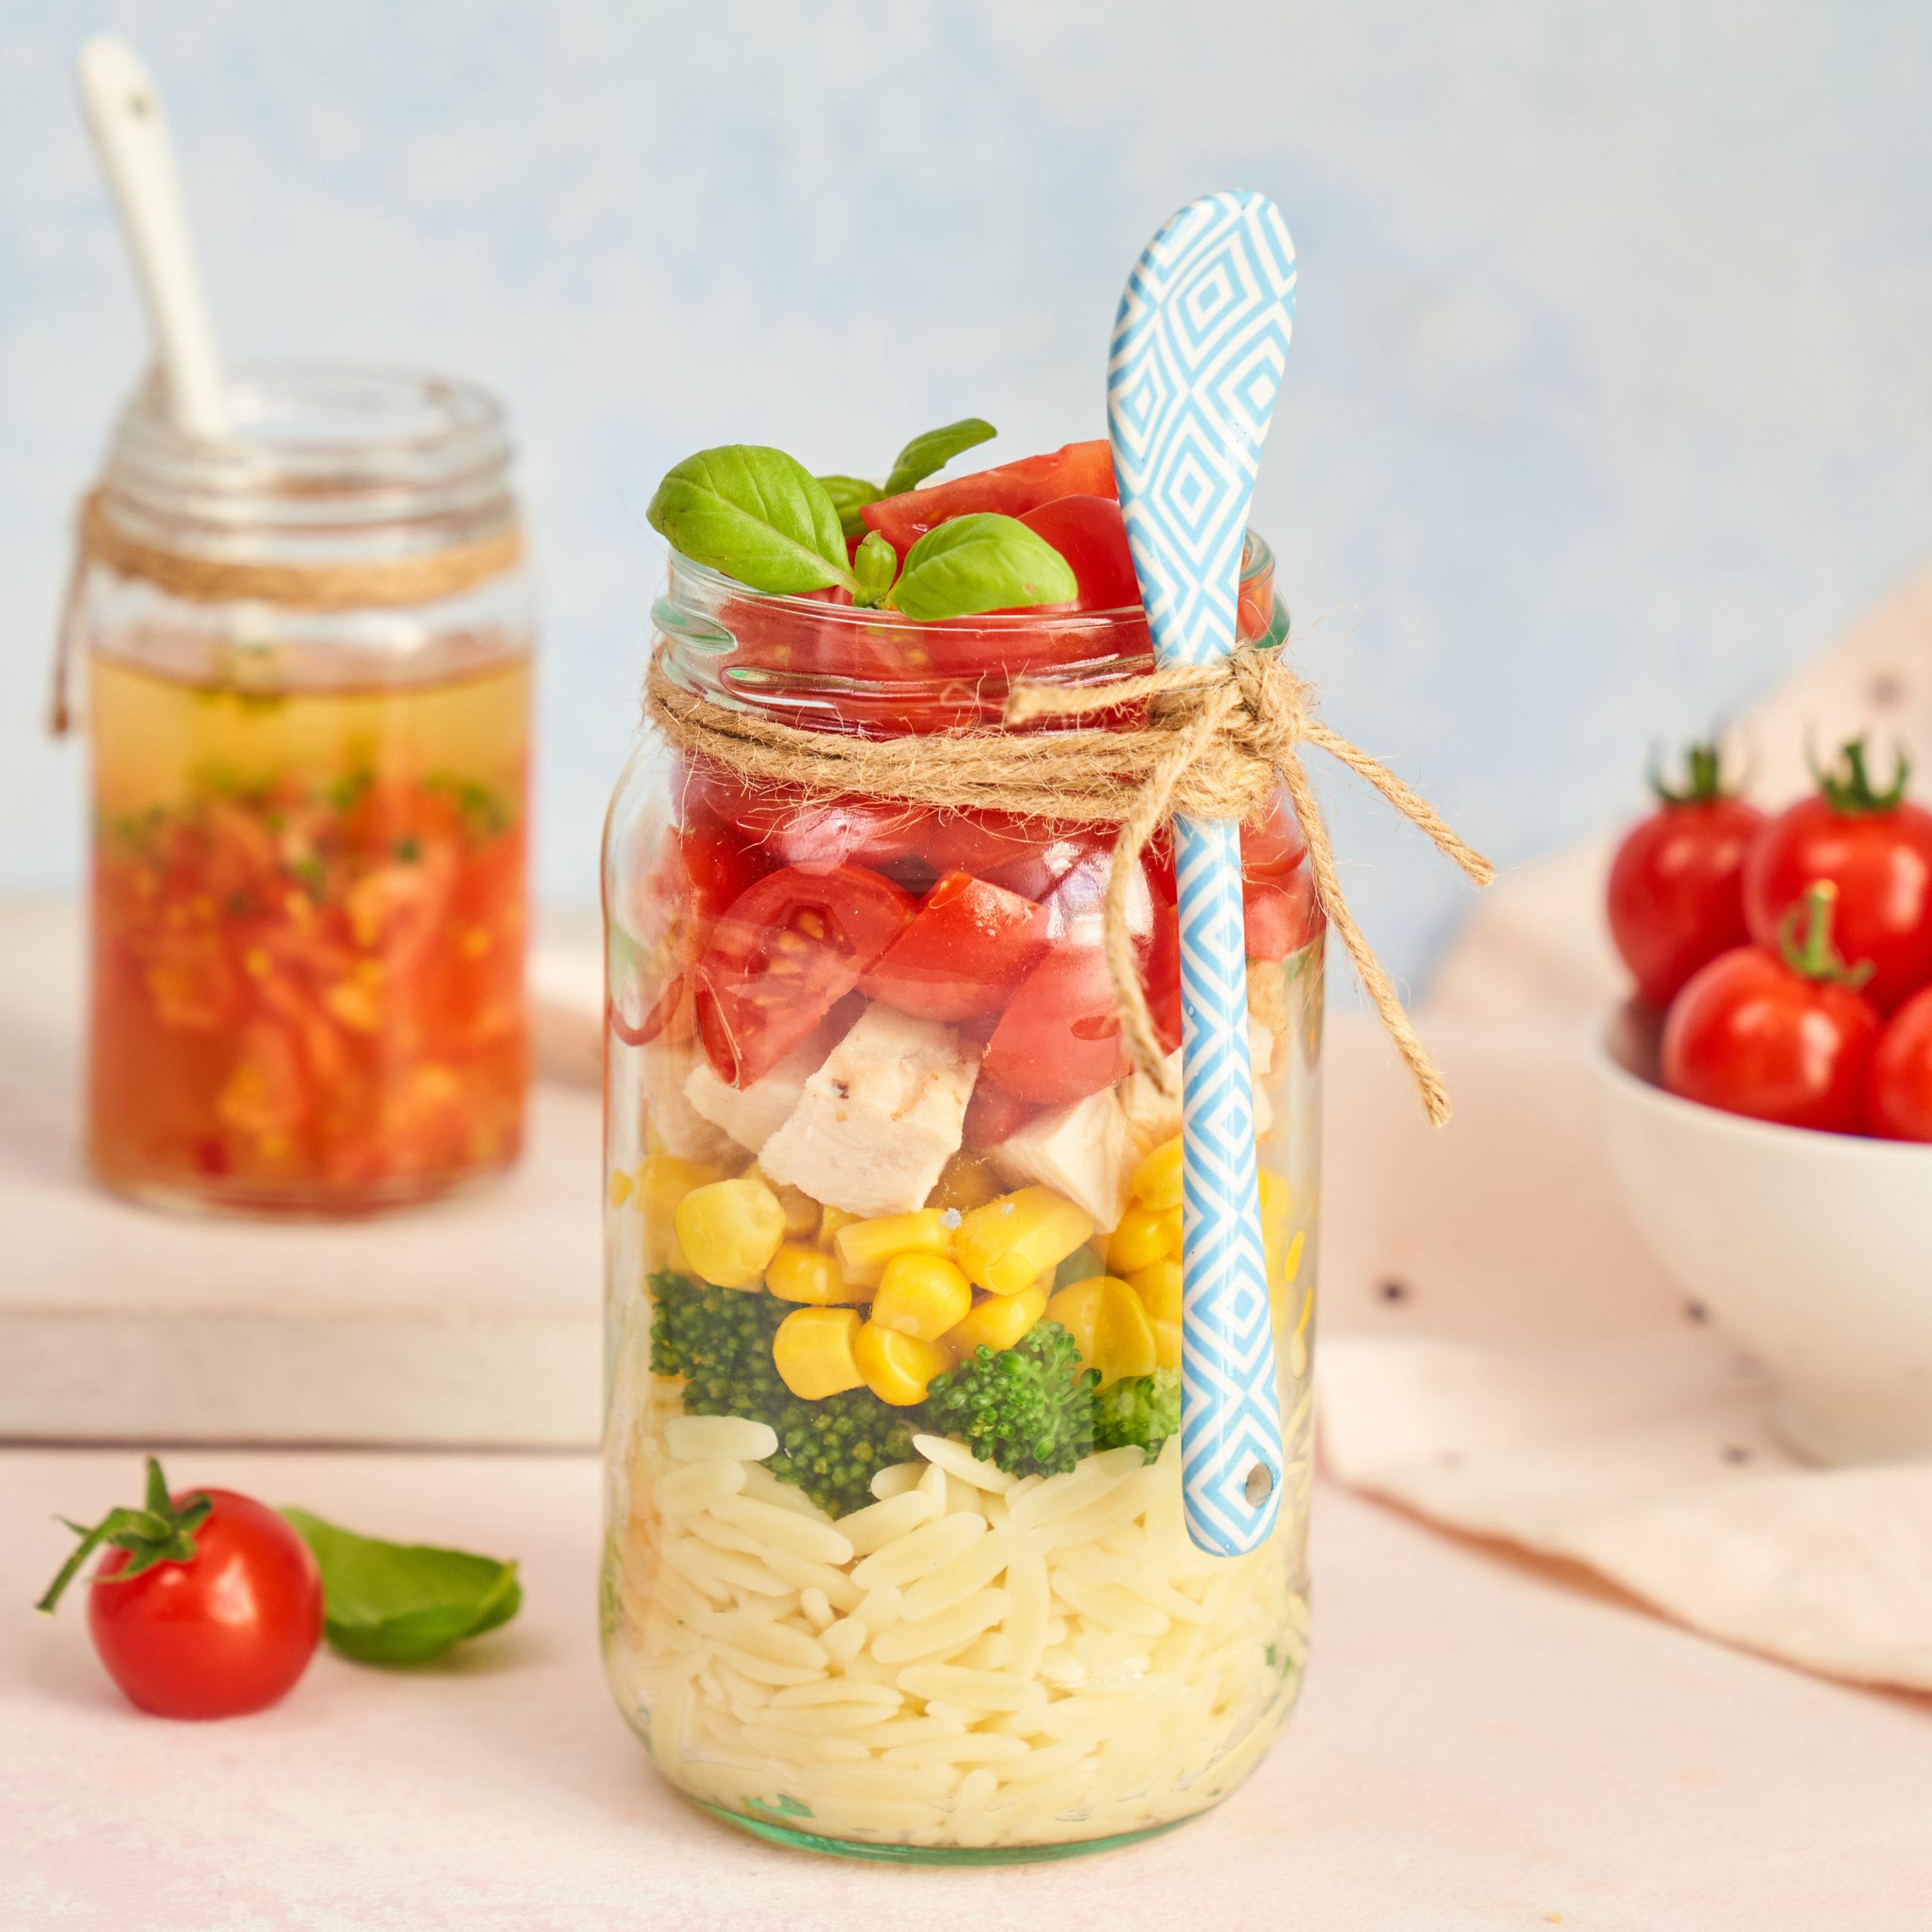 Rainbow Orzo Salad recipe by Annabel Karmel